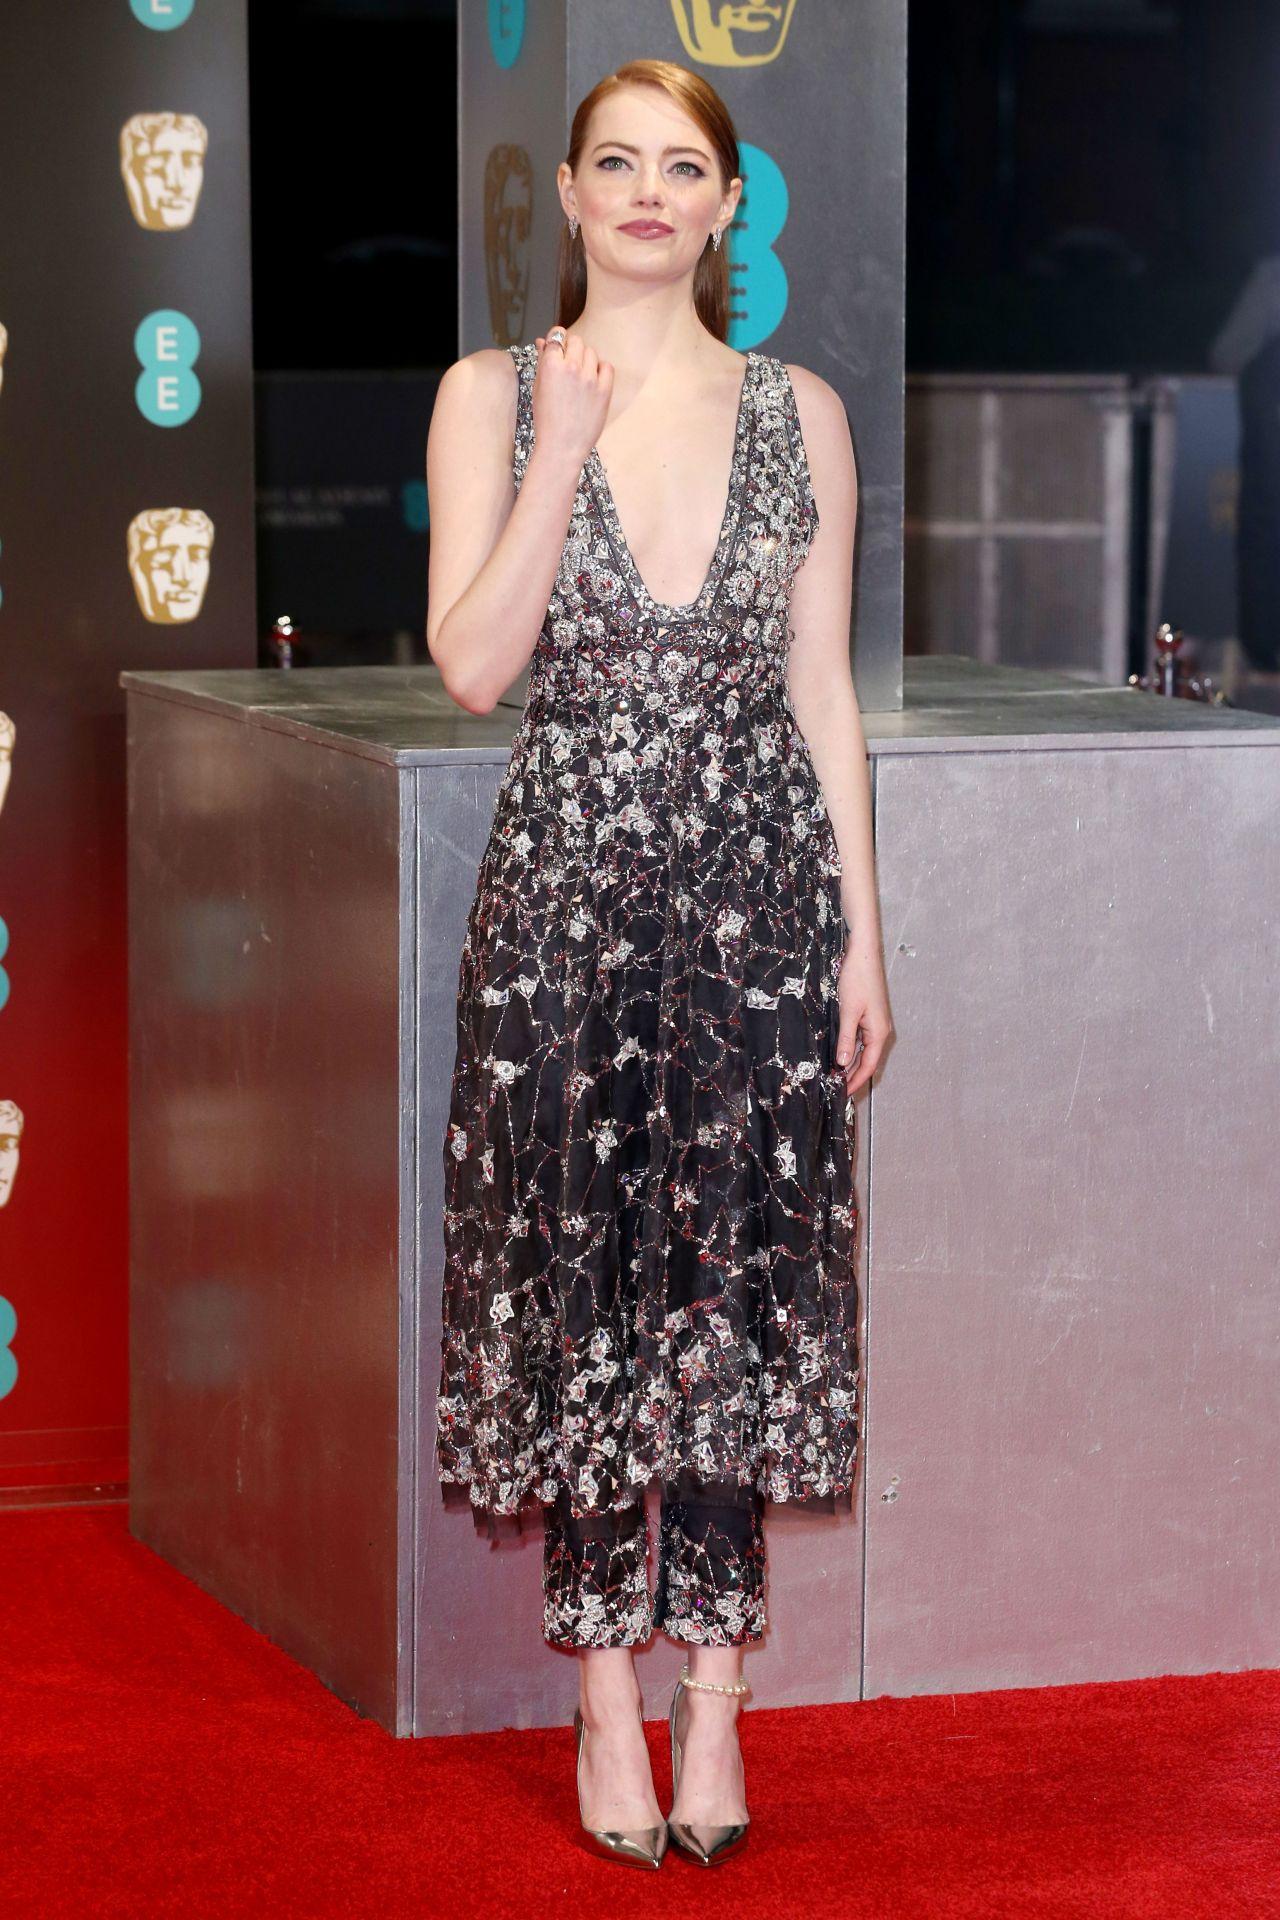 Emma Stone On Red Carpet At Bafta Awards In London Uk 2